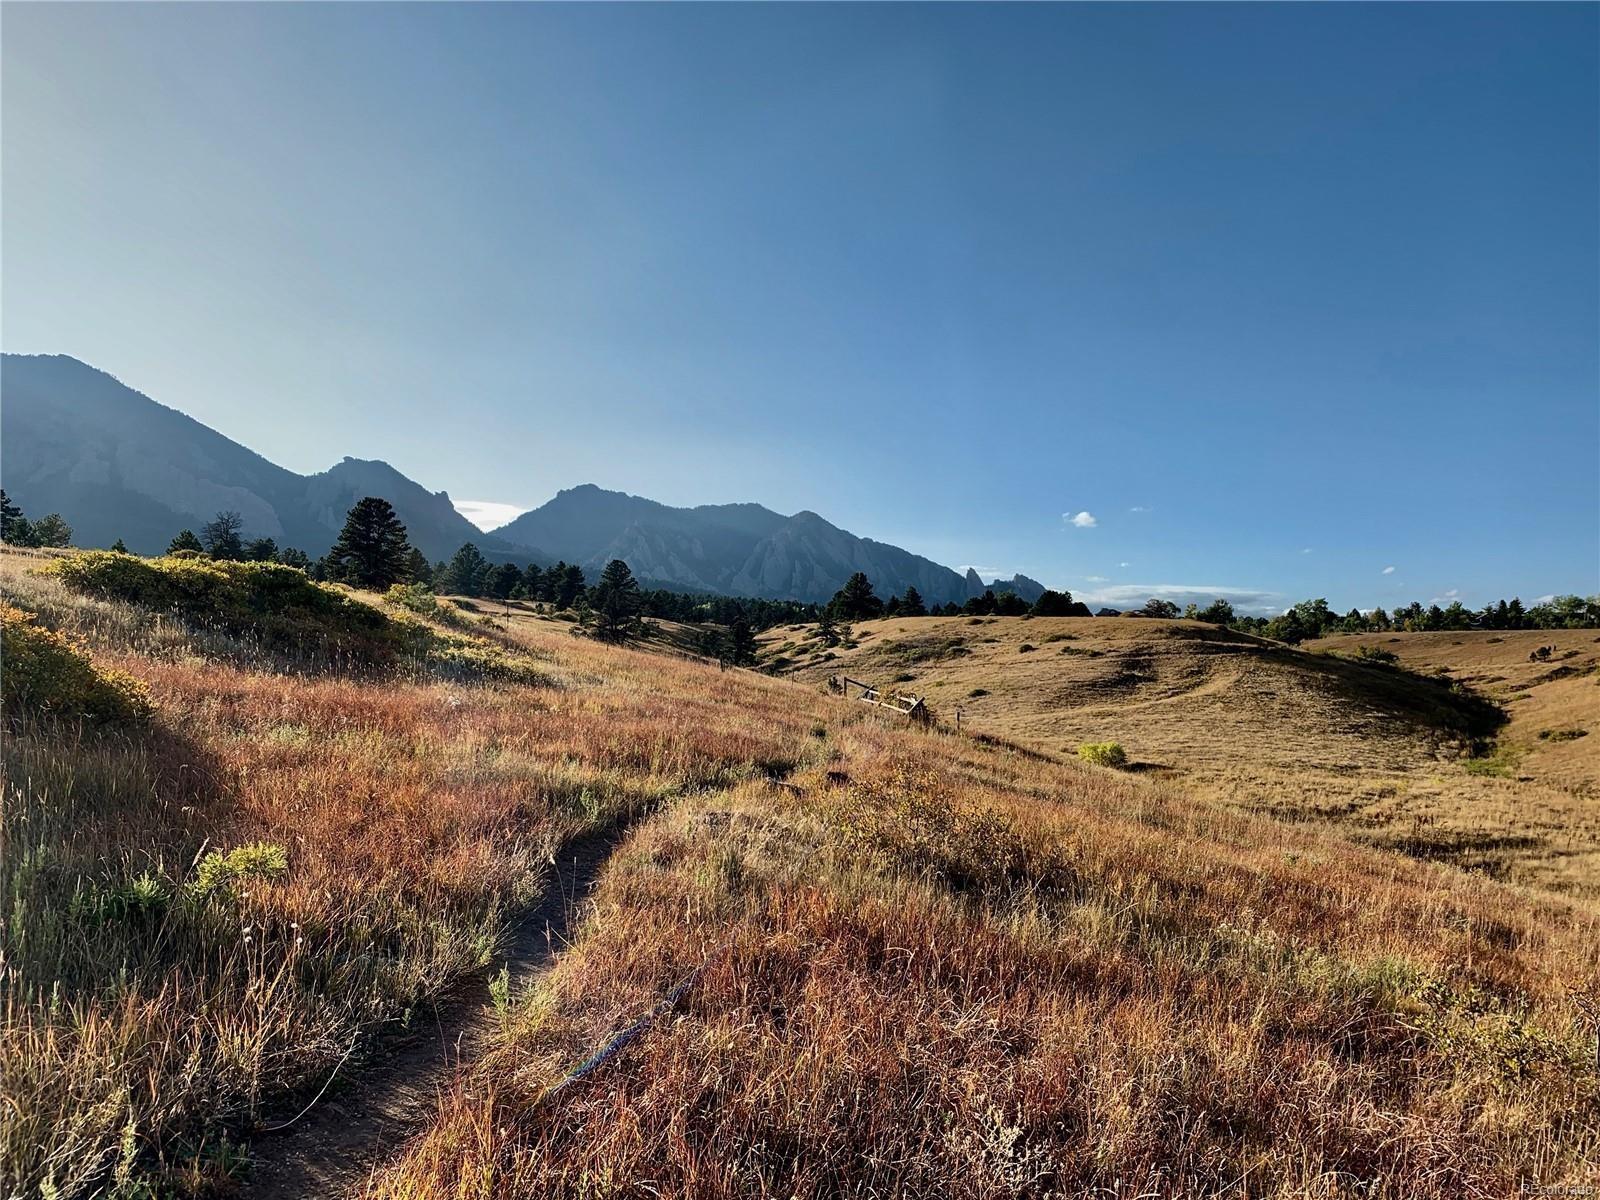 MLS# 6826635 - 34 - 3747 Telluride Circle, Boulder, CO 80305